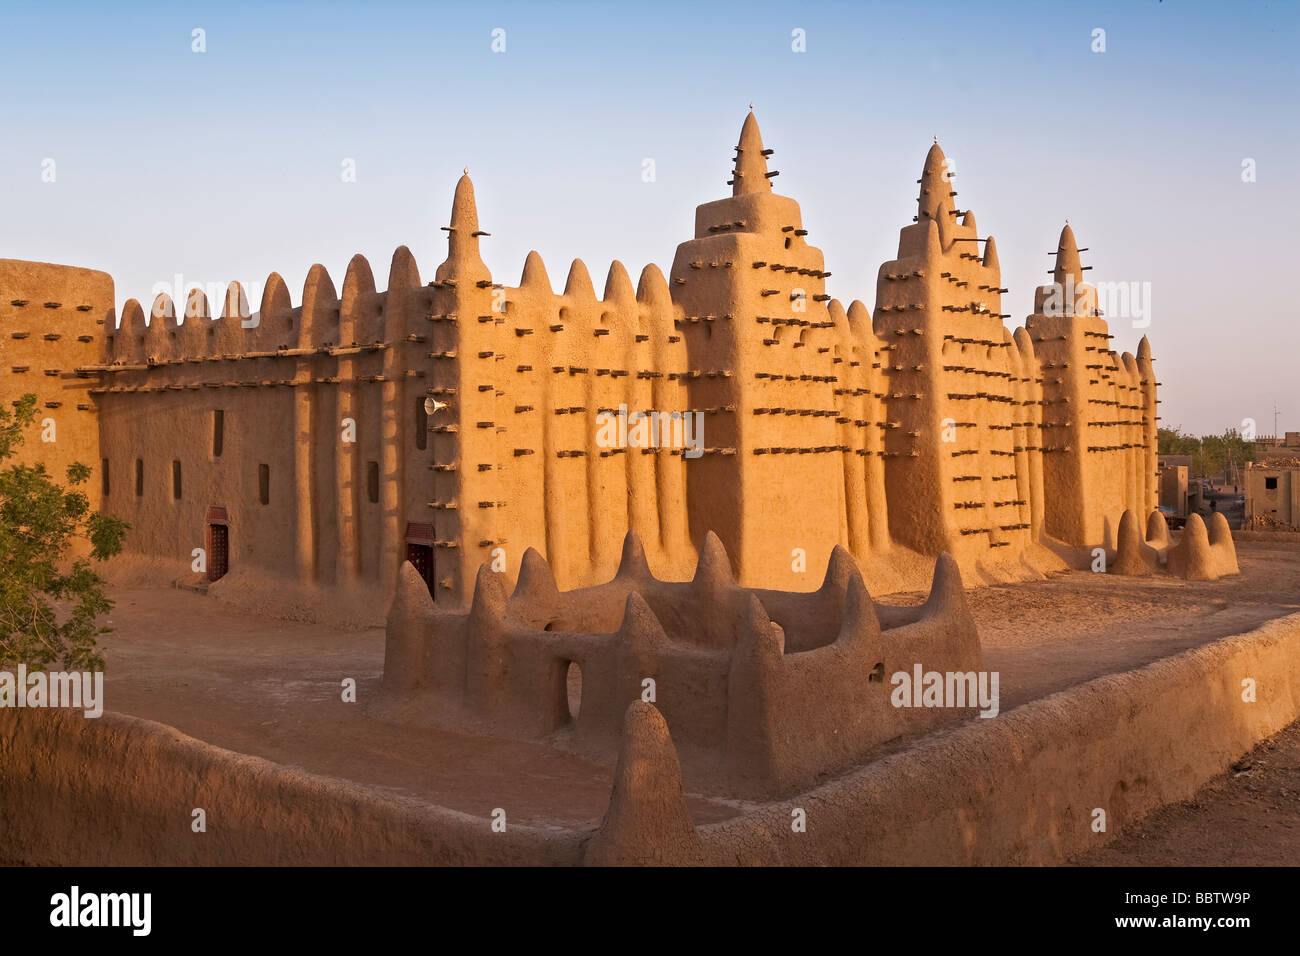 La Gran Mezquita de Djenne, Mopti, Djenne, región delta de Níger, Malí, África occidental Imagen De Stock